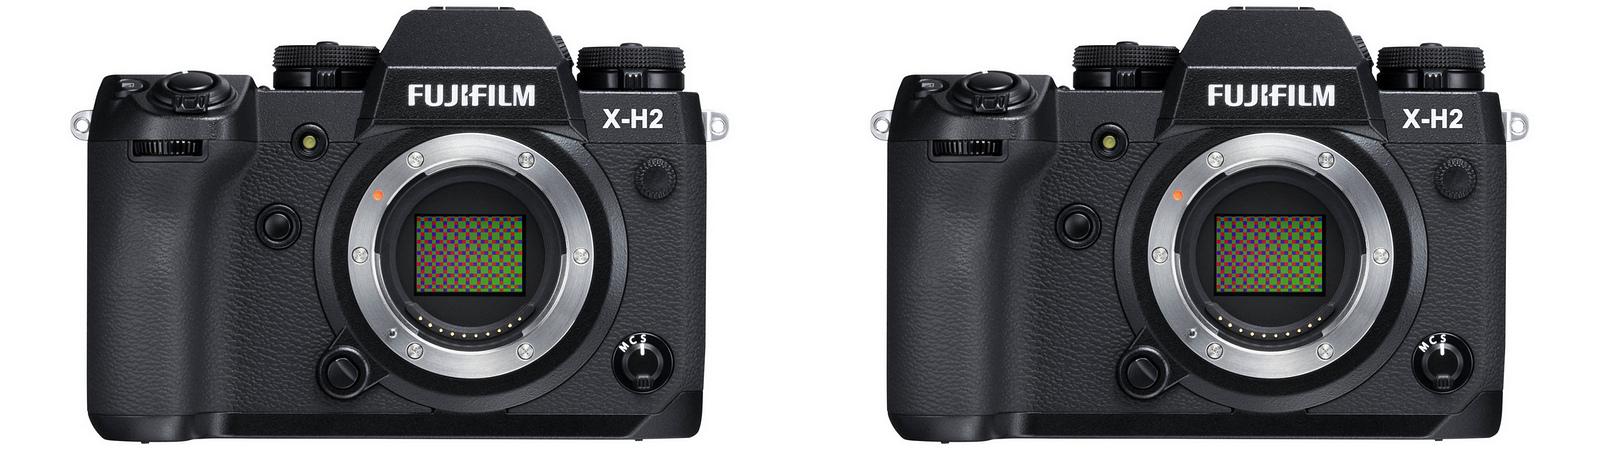 Две фотокамеры Fujifilm